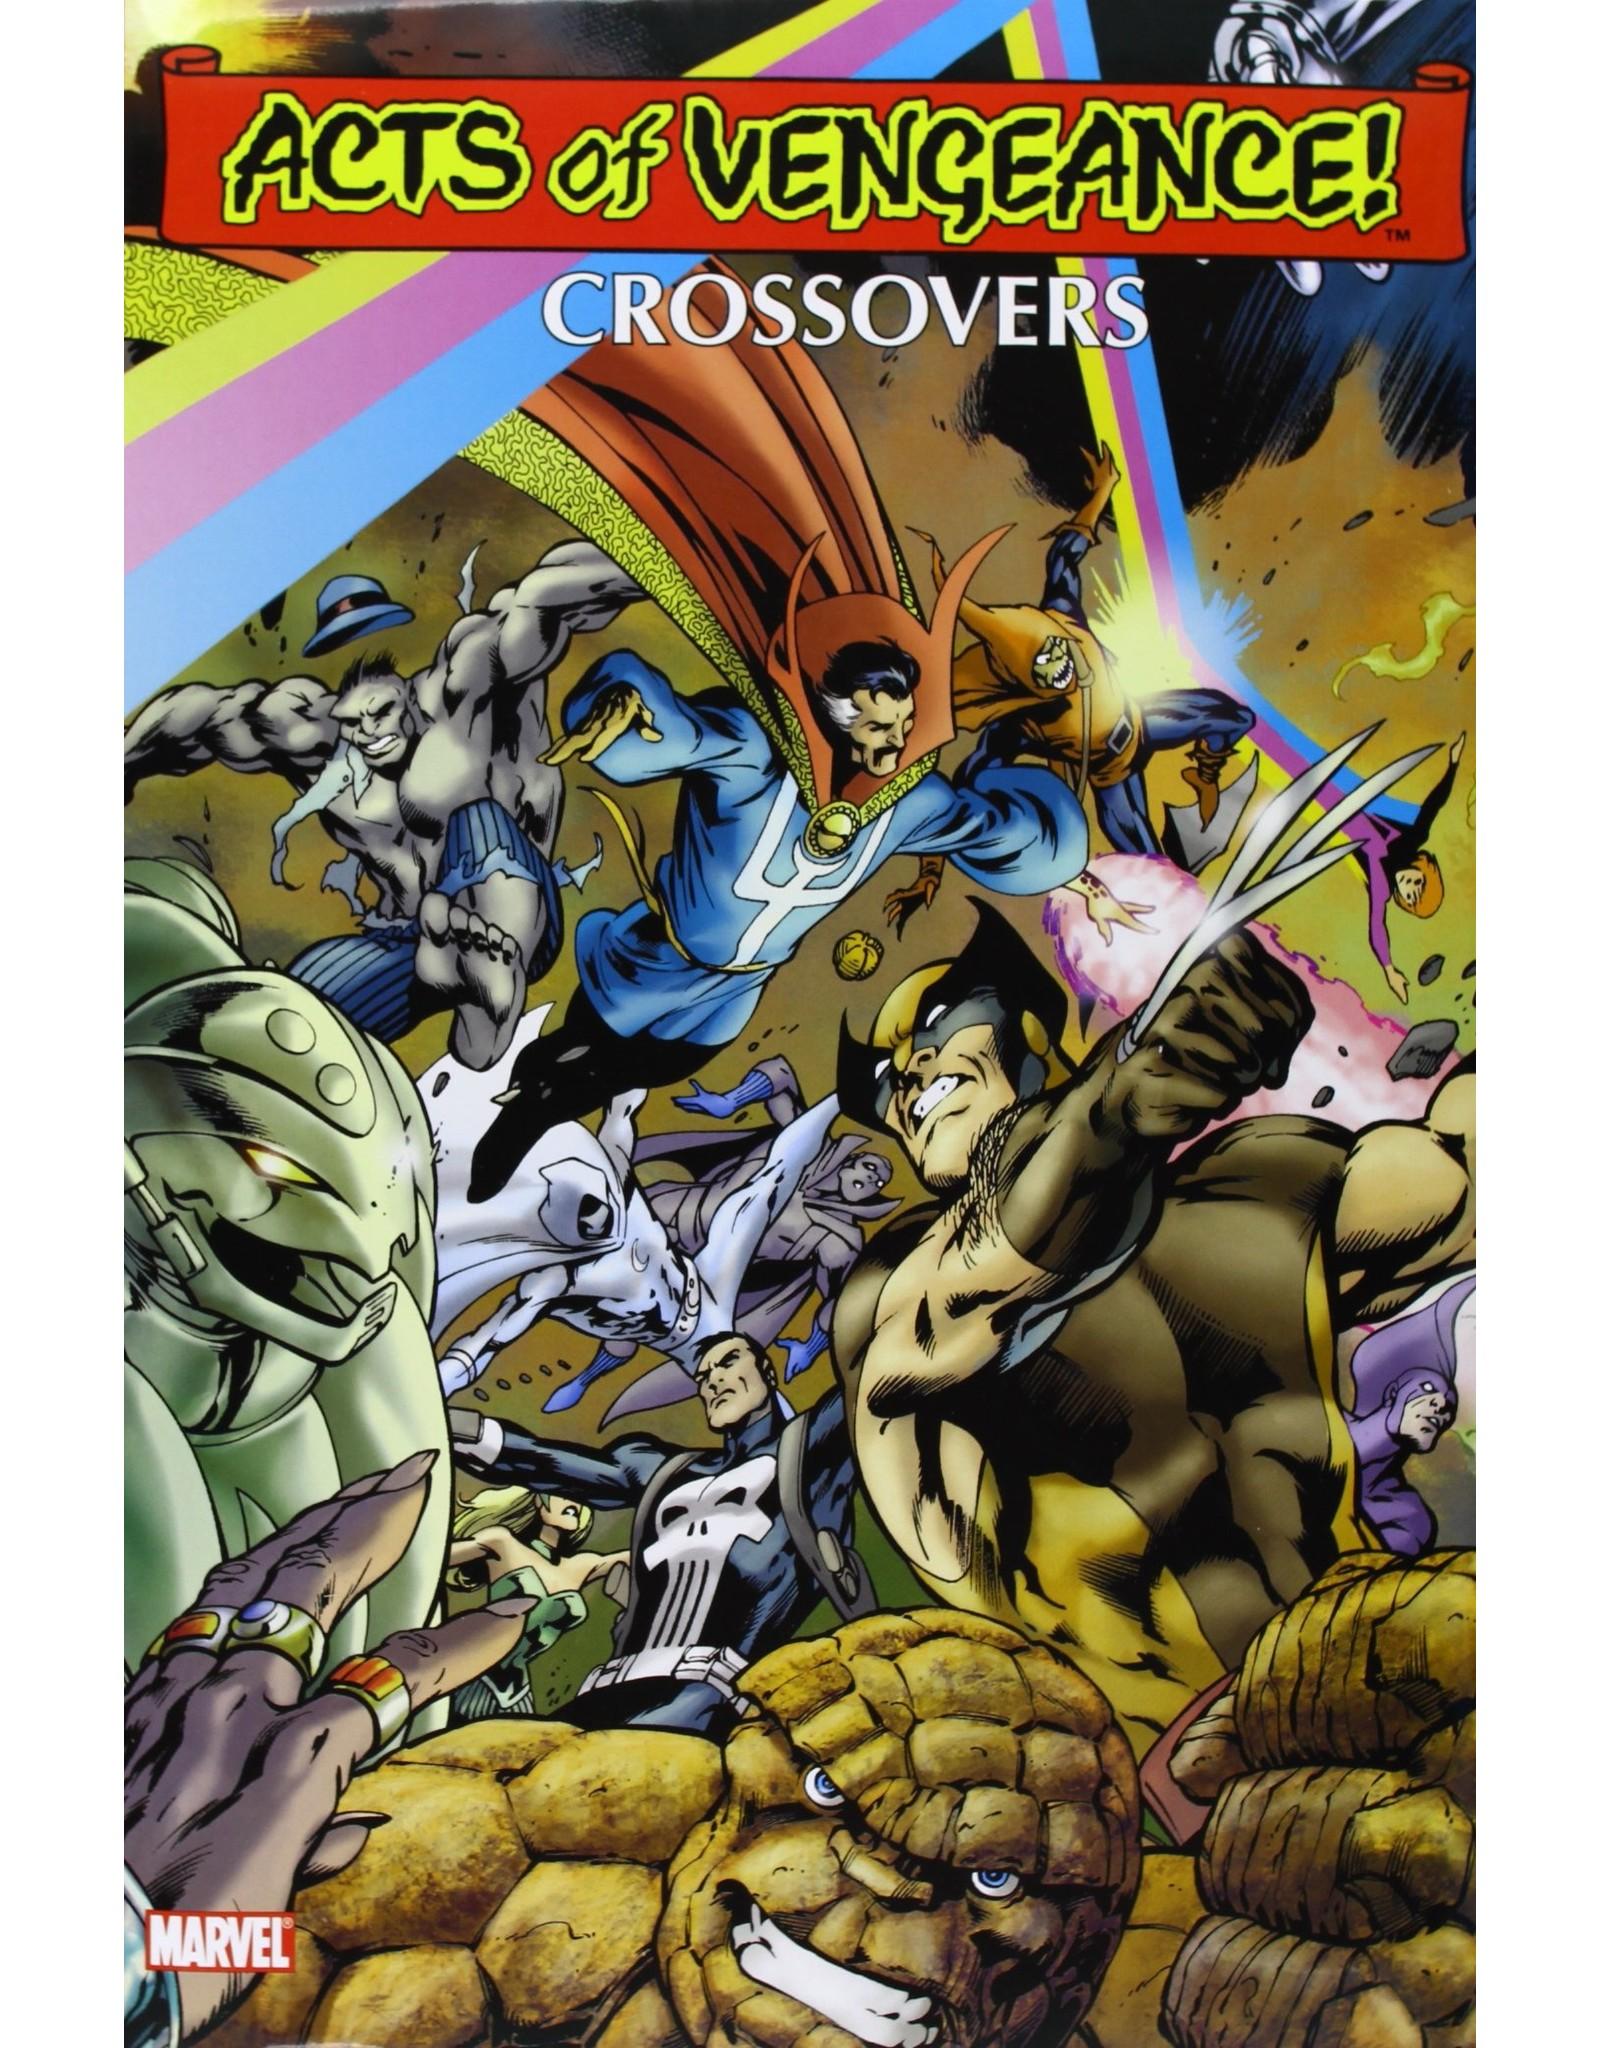 MARVEL COMICS ACTS OF VENGEANCE CROSSOVERS OMNIBUS HC DAVIS CVR (OOP SEALED)